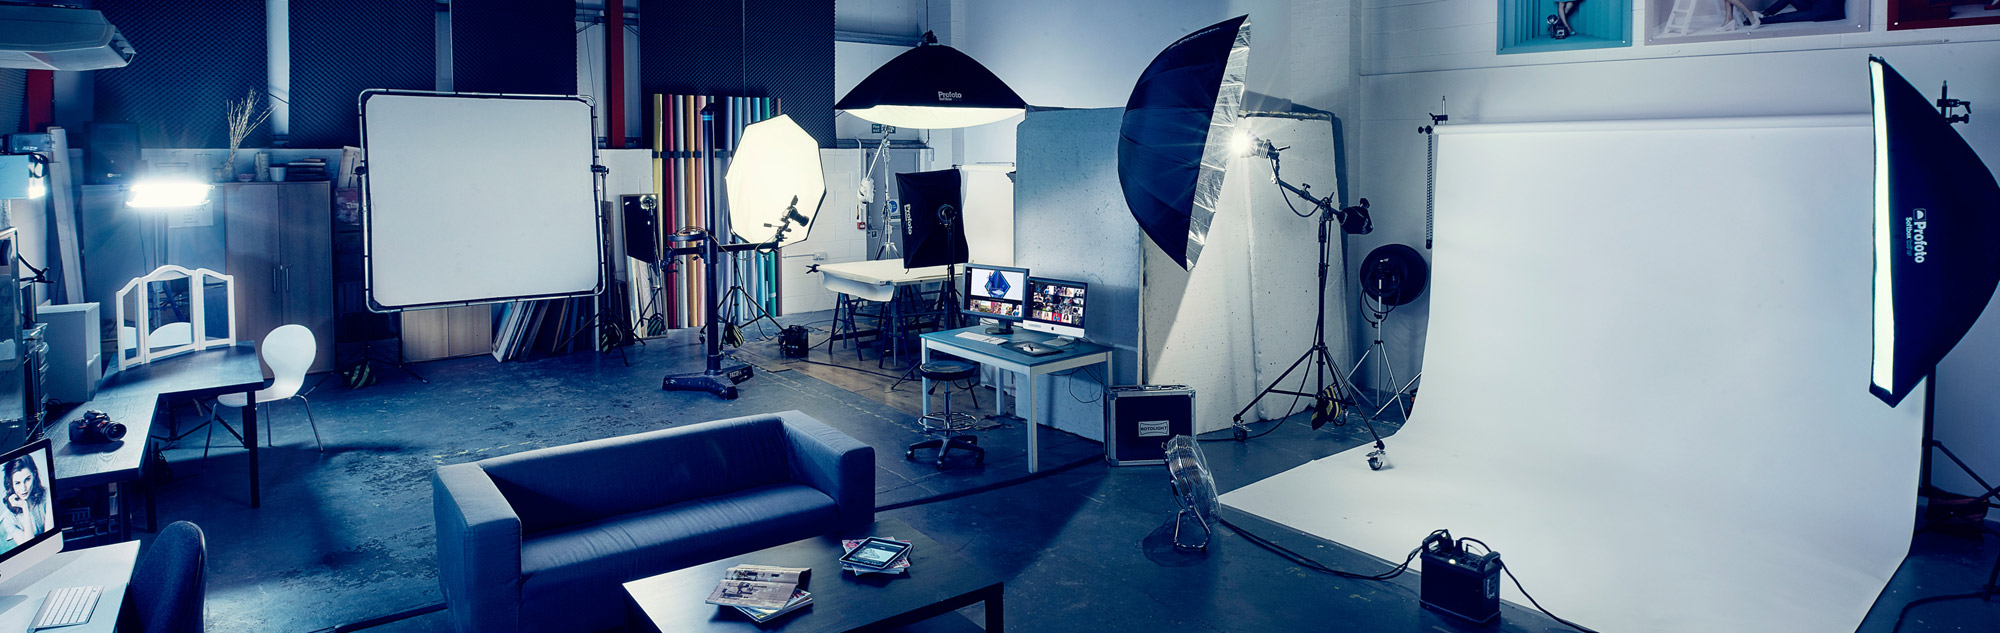 CliQQ Photography studio, Essex